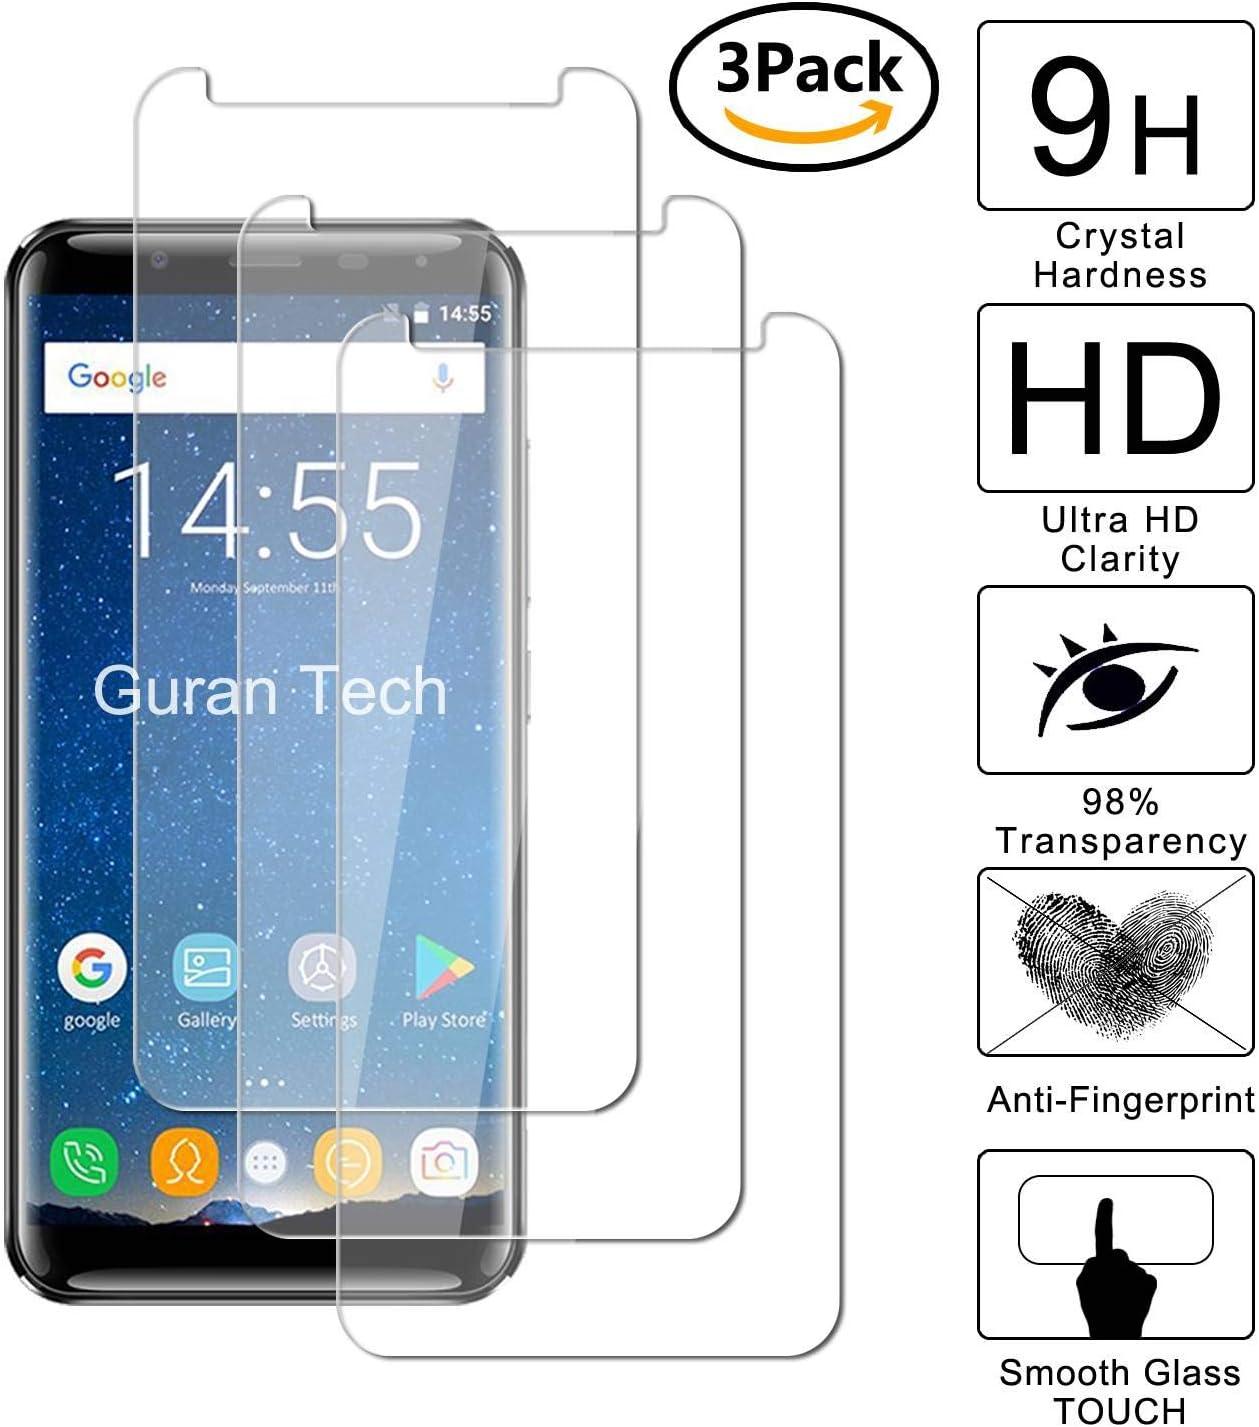 Guran [3 Unidades] Protector de Pantalla Vidrio Cristal Templado para Oukitel K5000 Smartphone Glass Vidrio Templado Film (9H, 2.5D Edge, 0.3mm): Amazon.es: Electrónica